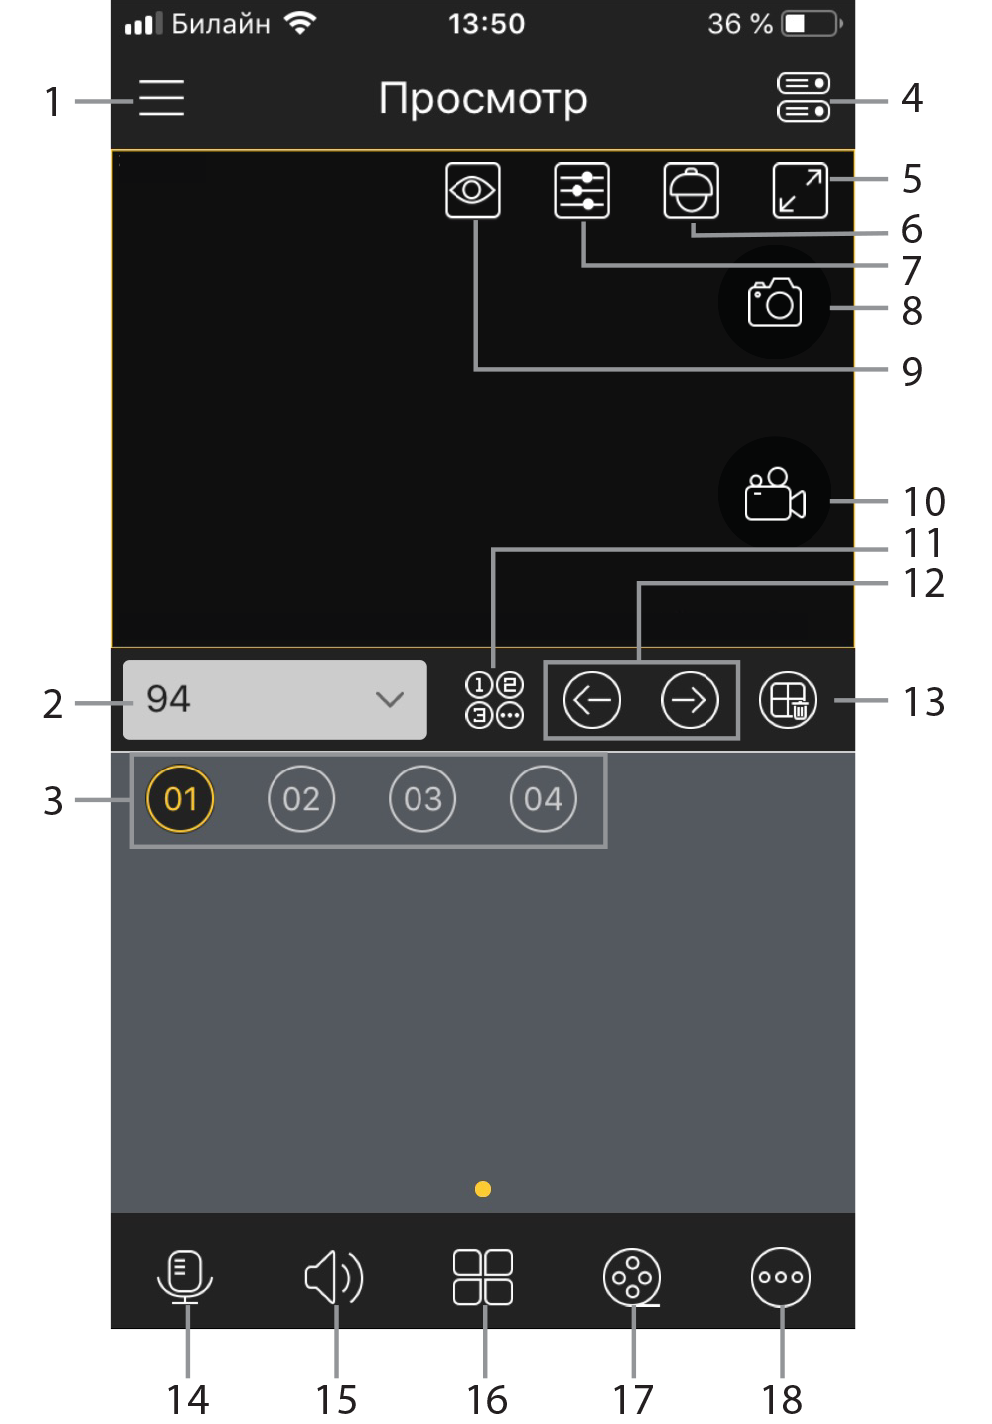 Основные меню программы Q-See QT View